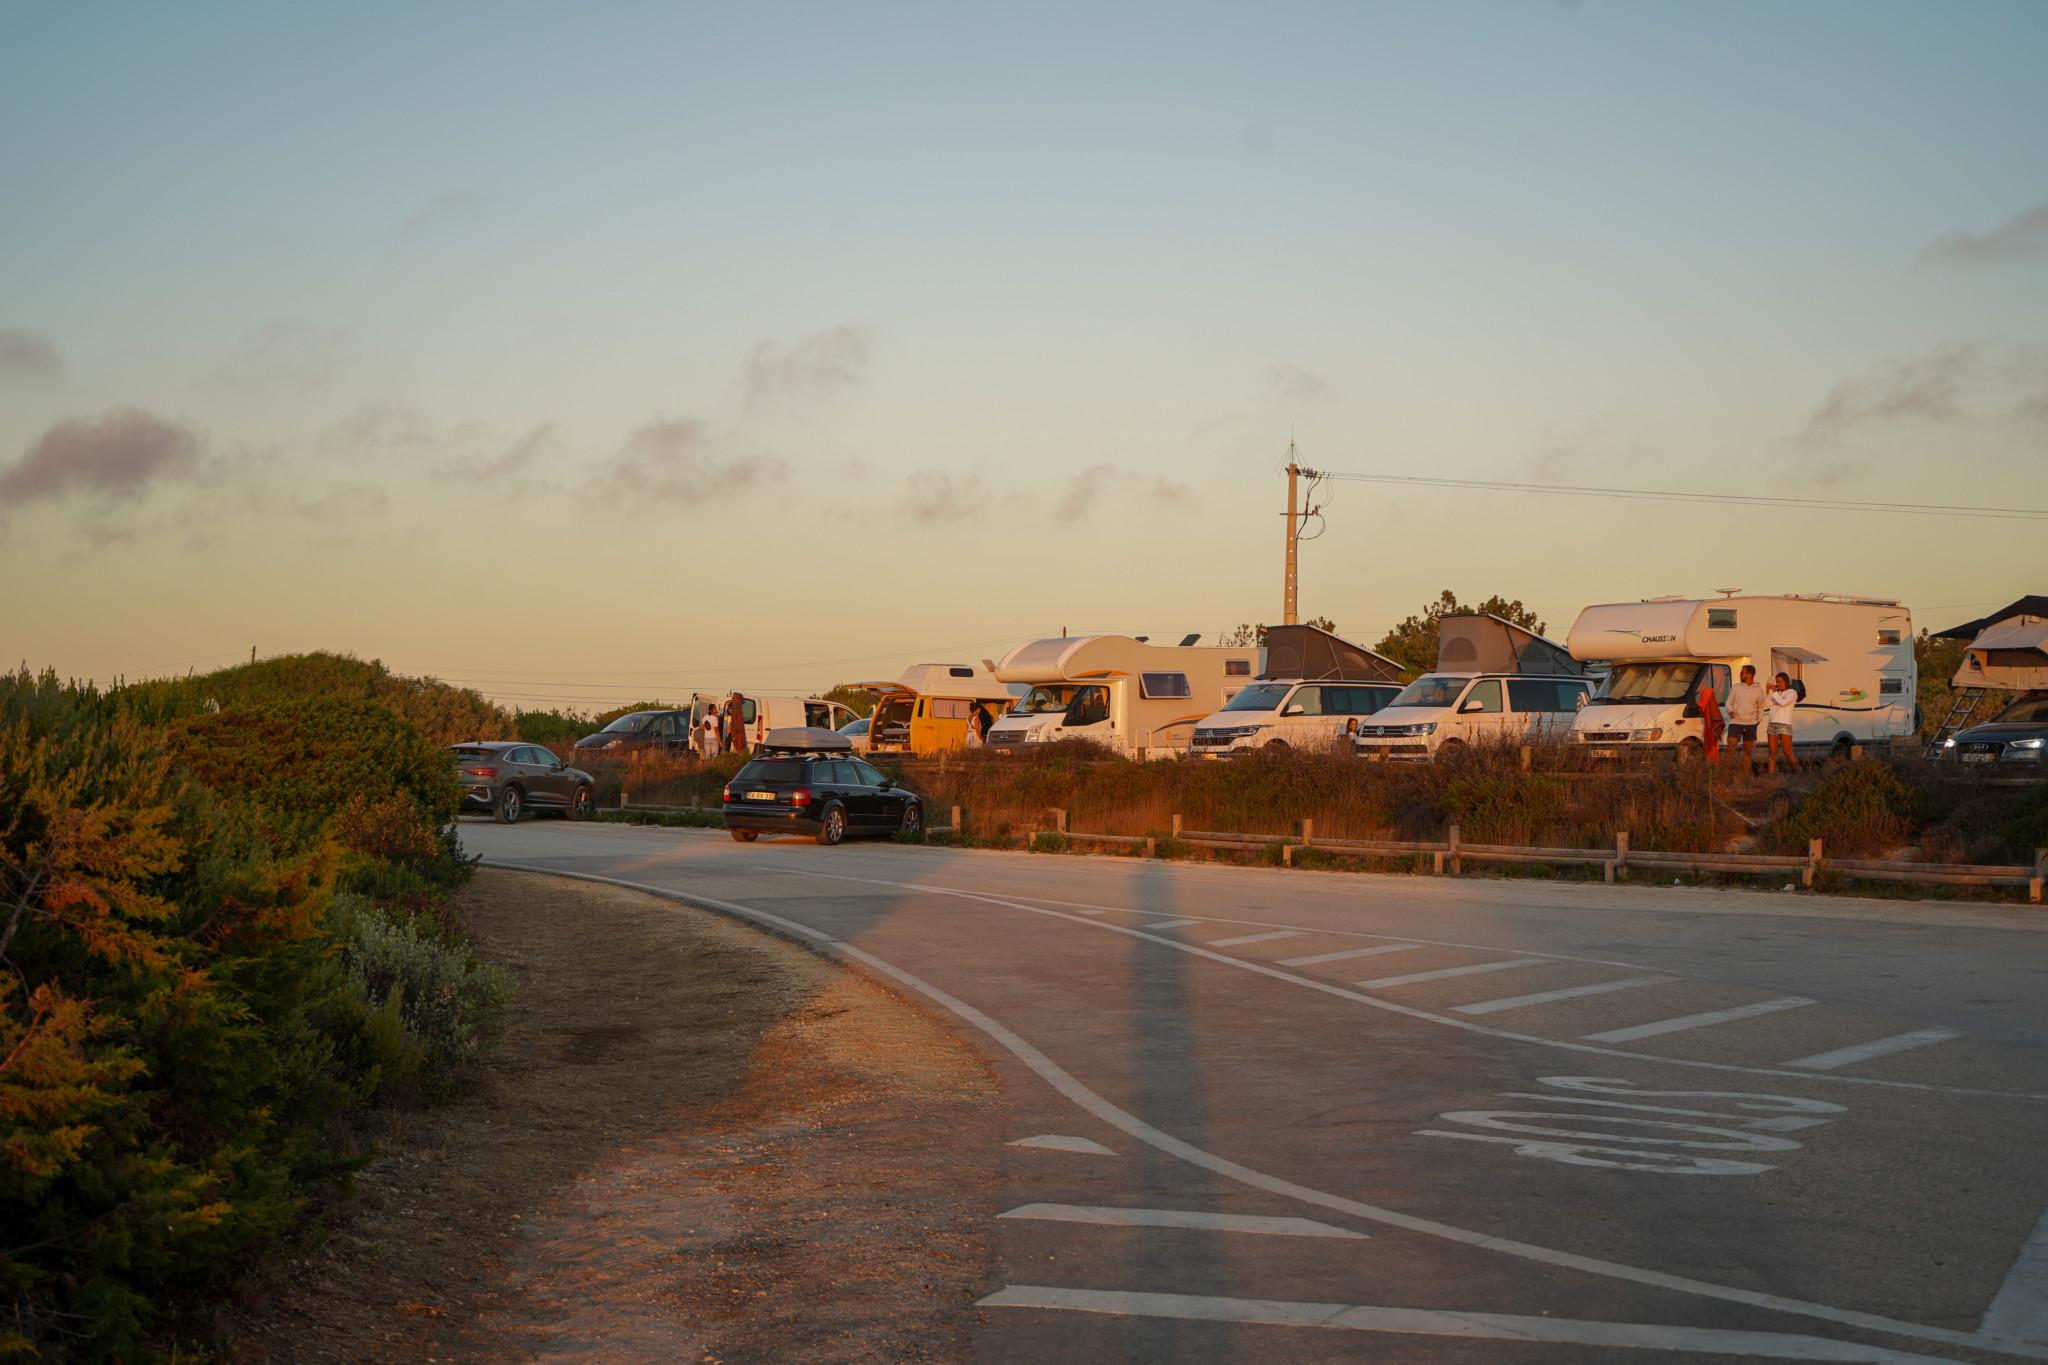 Straße in Odeceixe an der Algarve